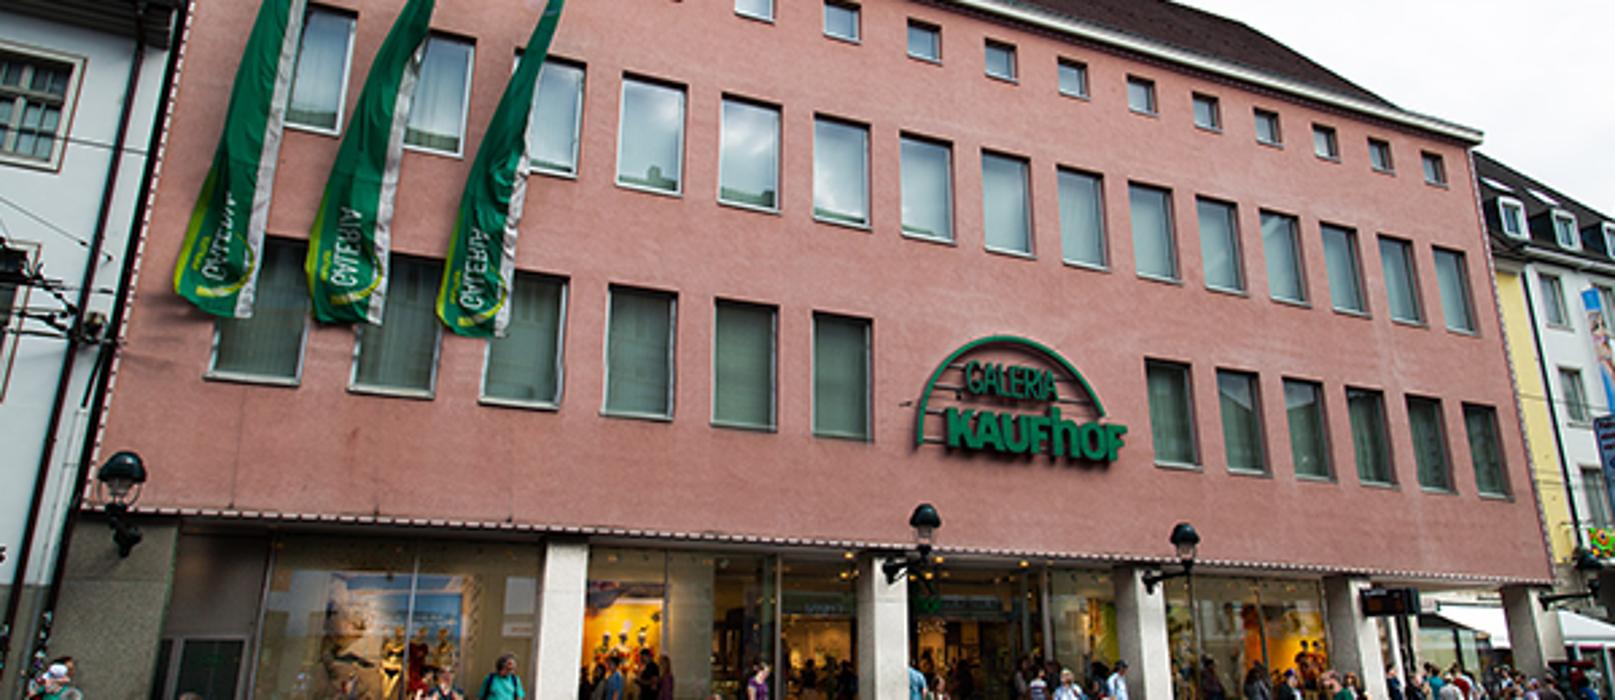 GALERIA (Kaufhof) Freiburg Kaiser-Joseph-Straße, Kaiser-Joseph-Str. in Freiburg